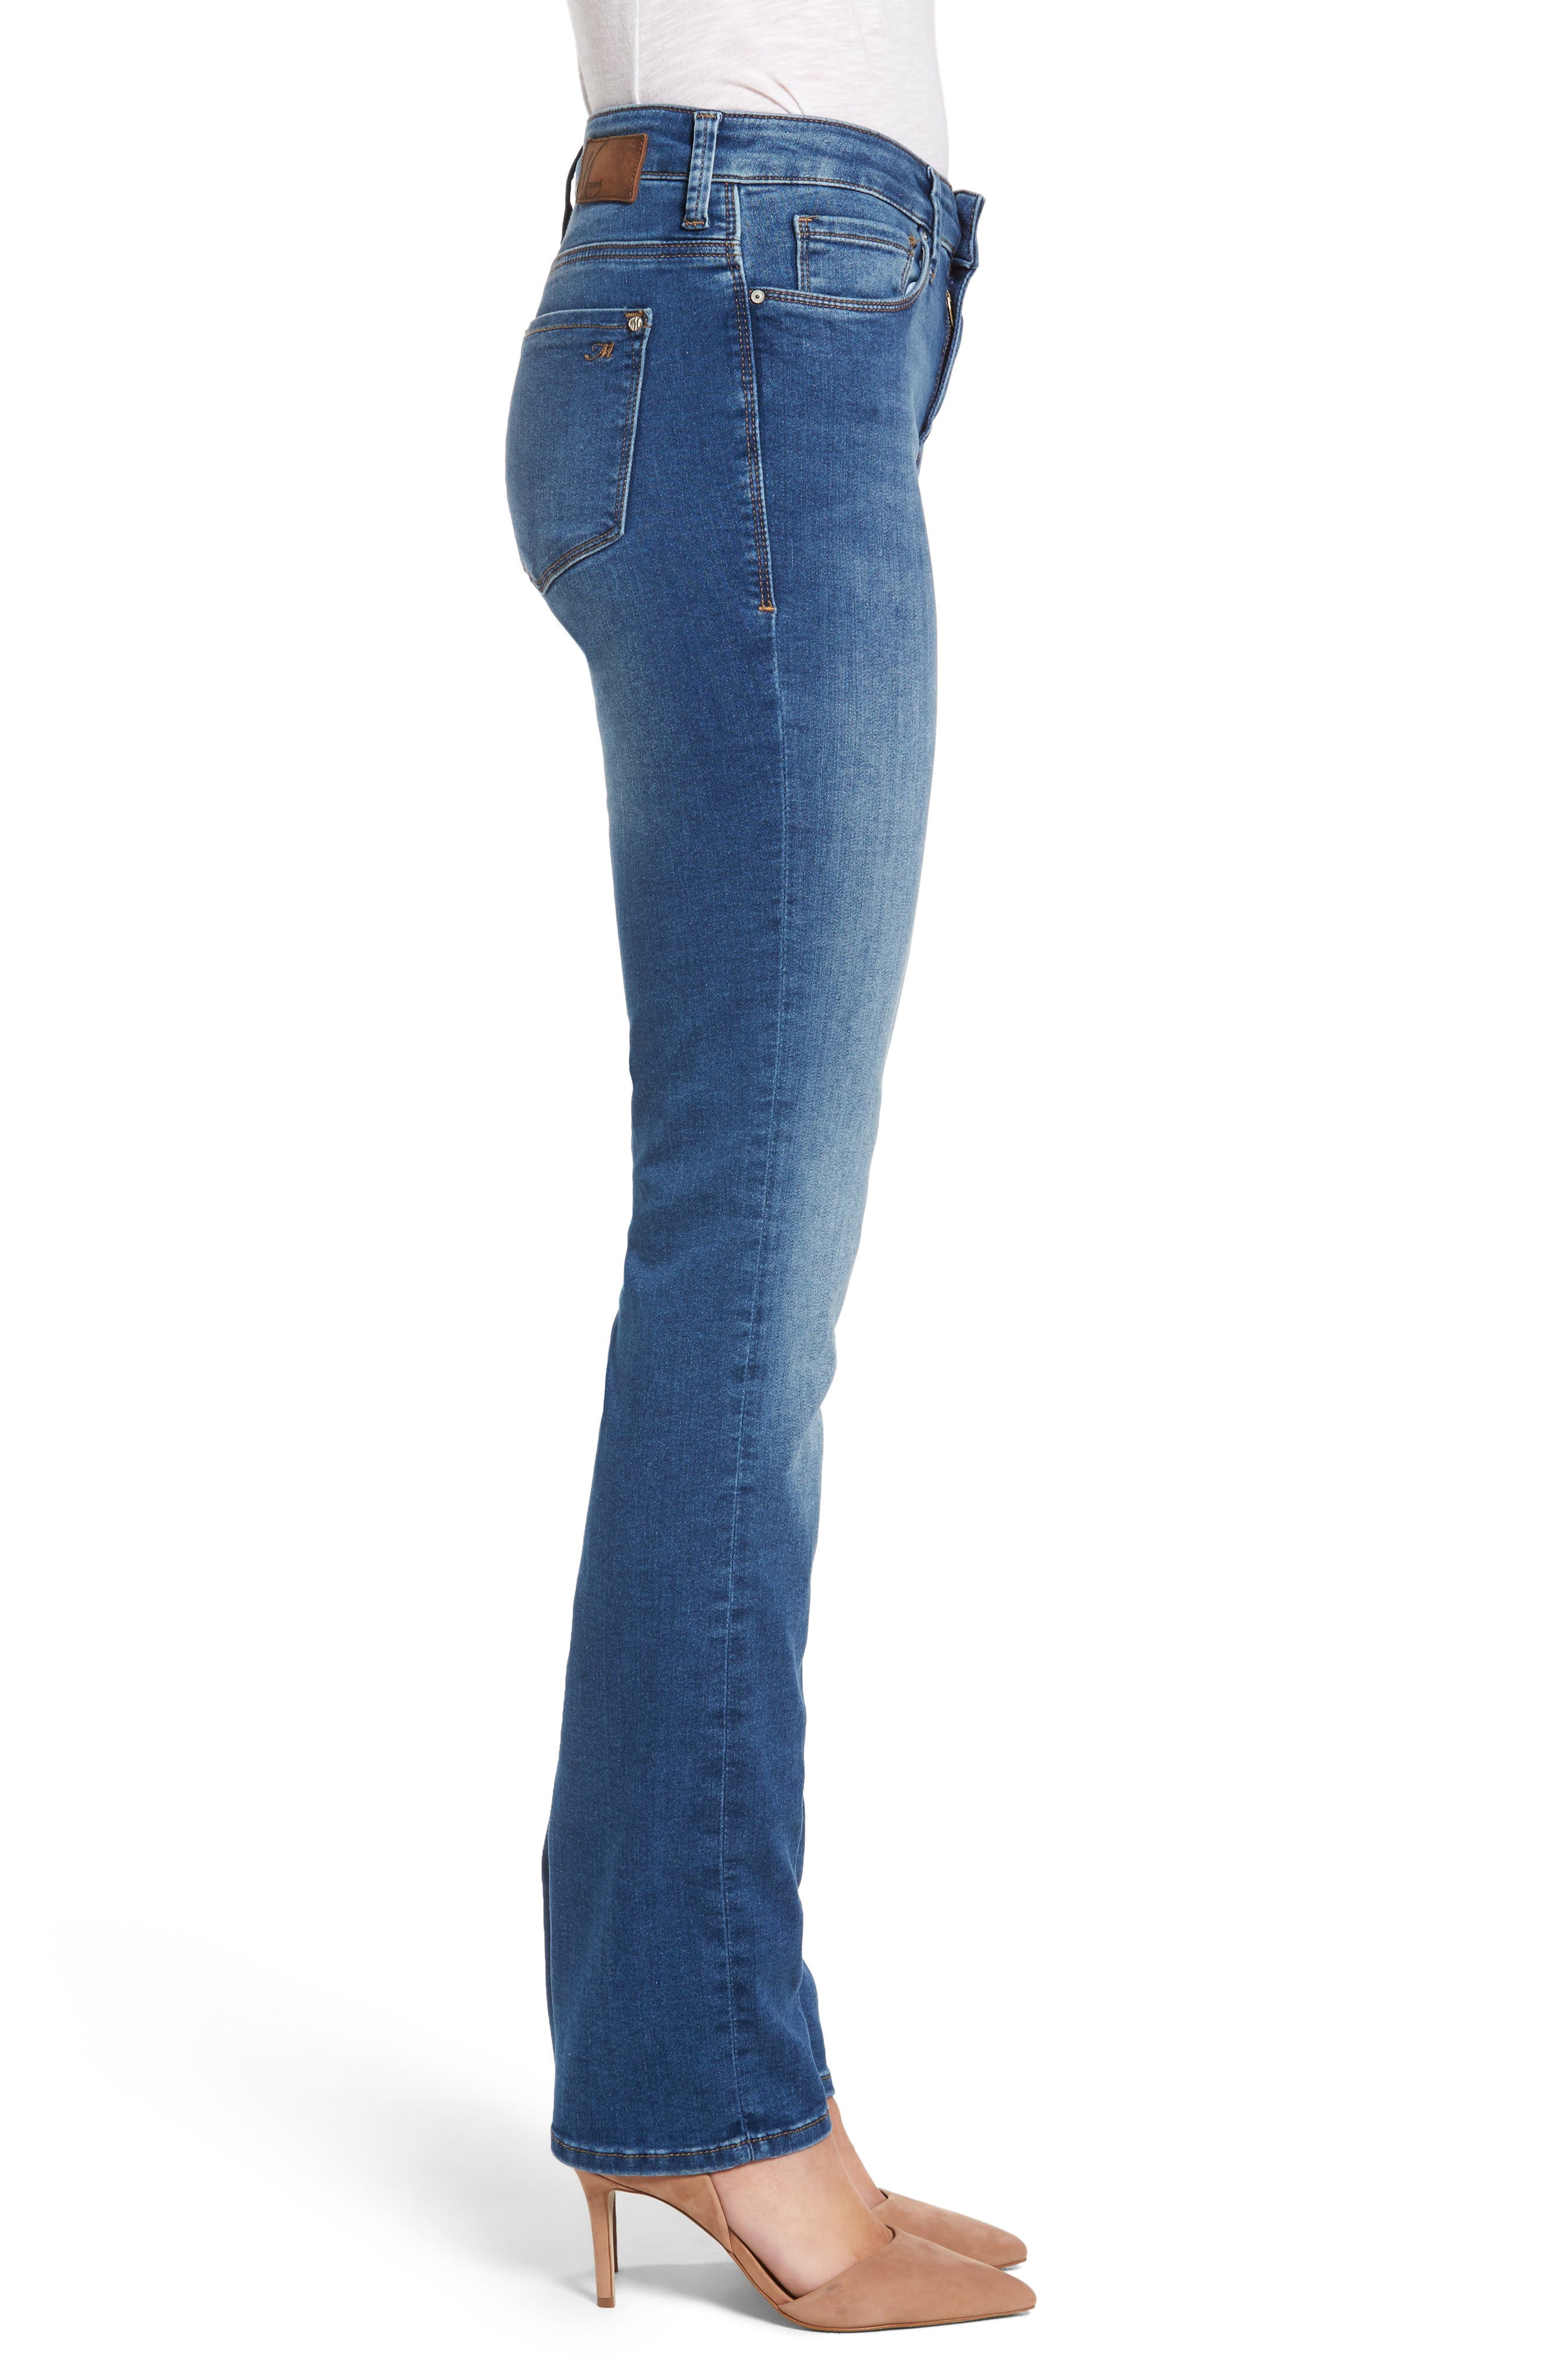 Kendra High Waist Stretch Denim Jeans,                             Alternate thumbnail 3, color,                             650